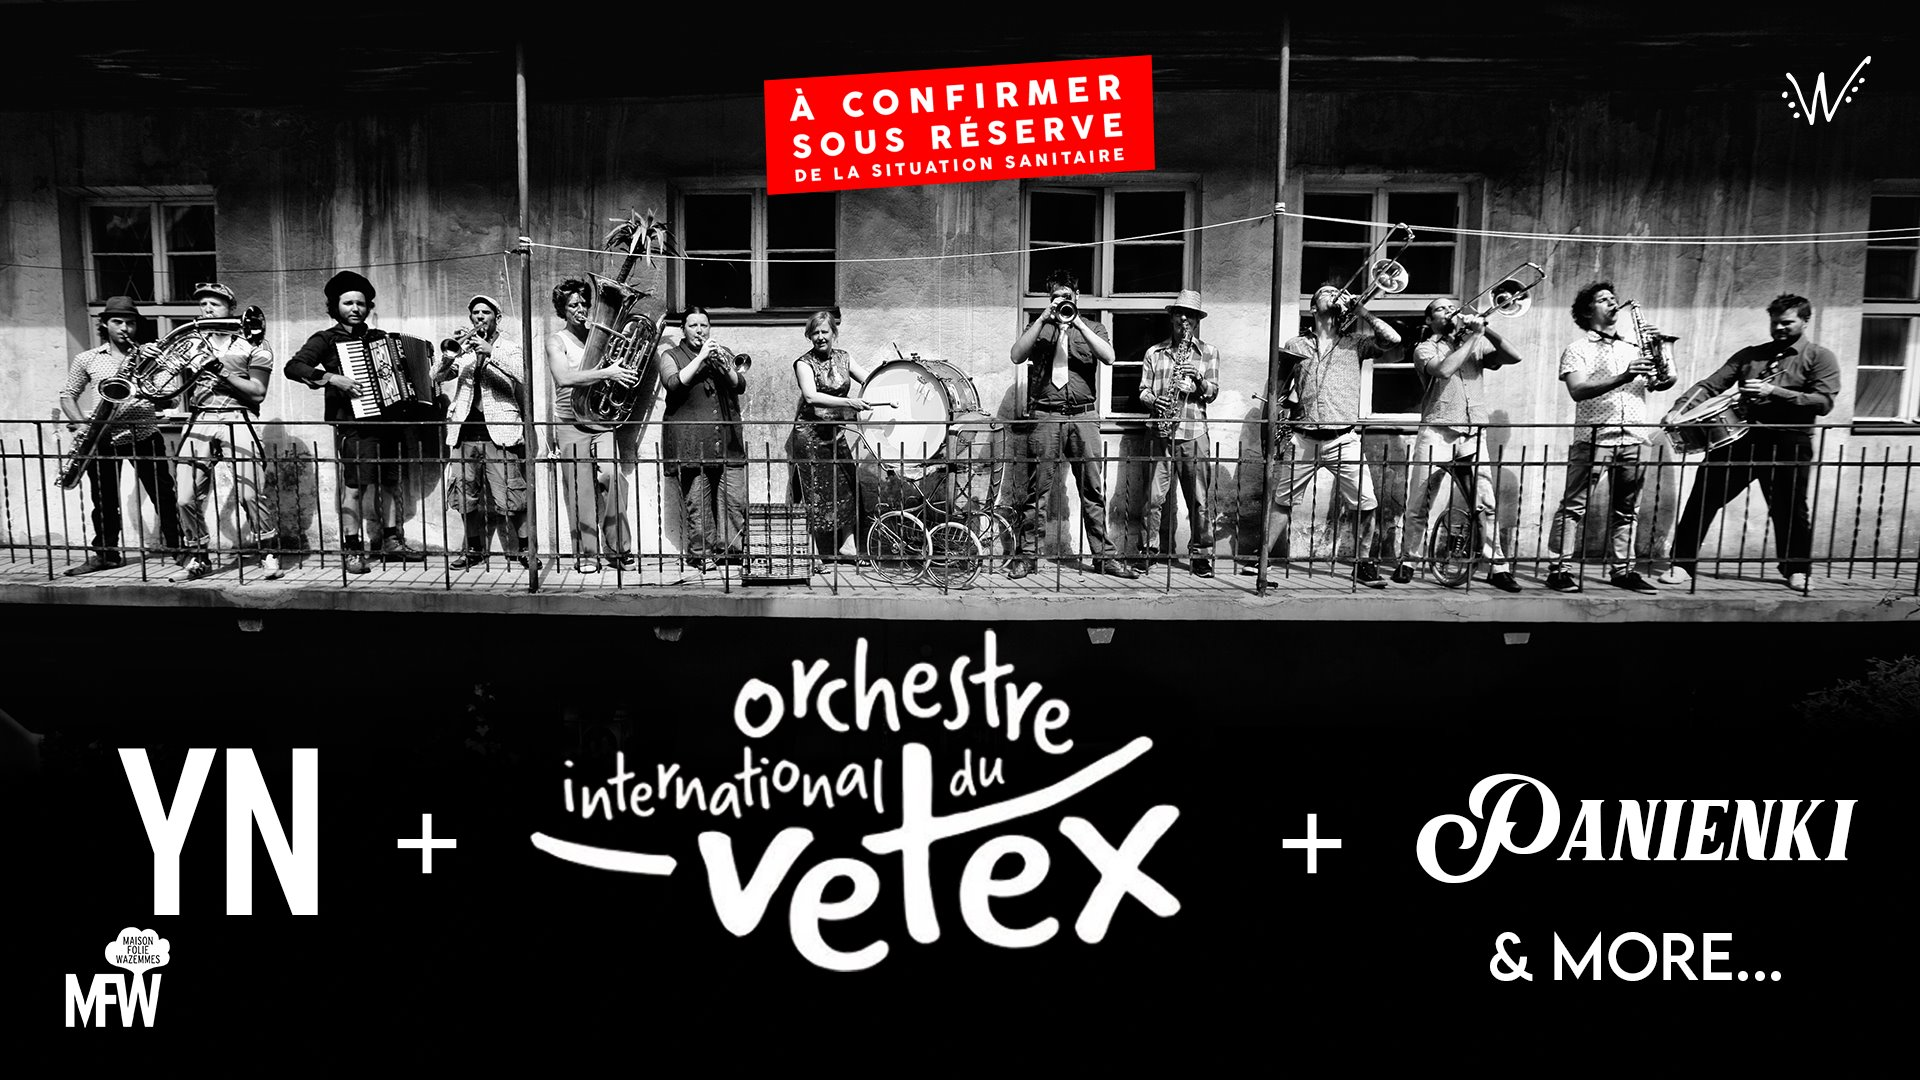 Vetex & Panienki & YN – Wazemmes l'Accordéon